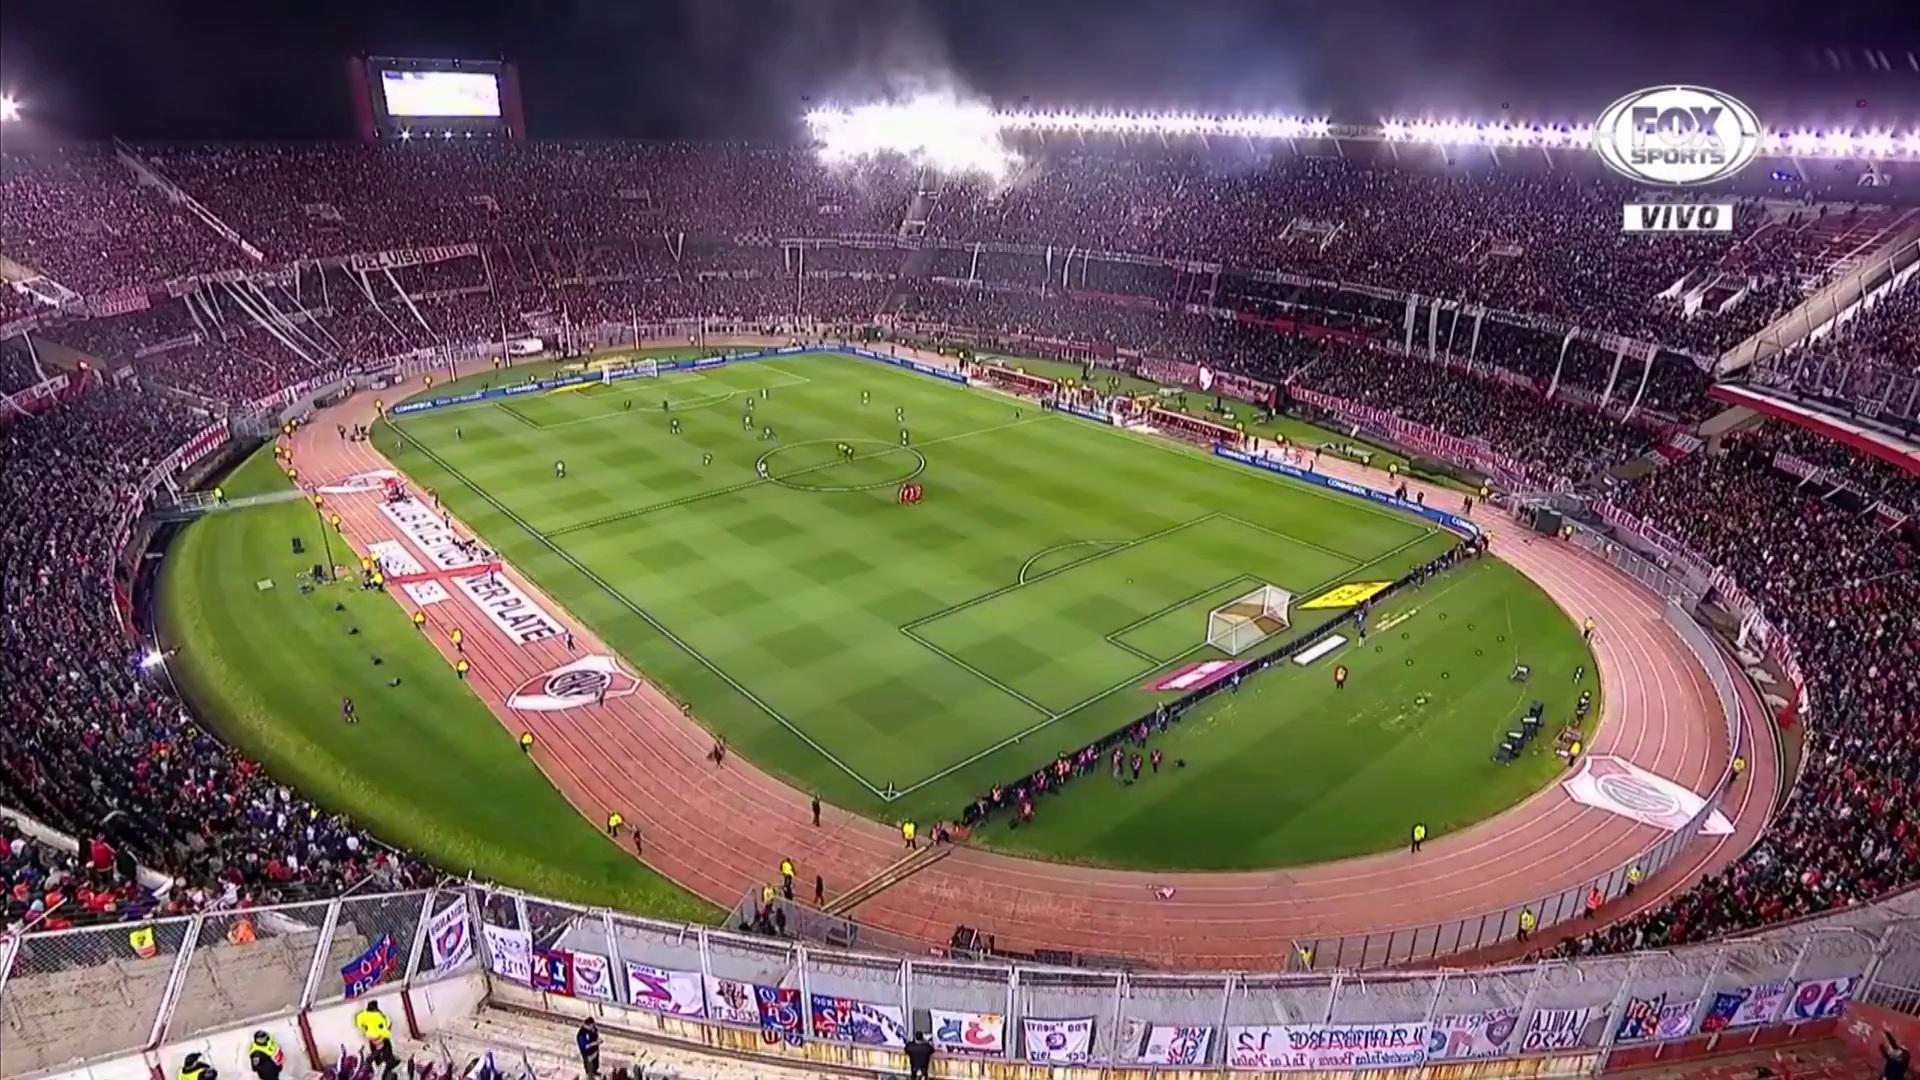 Copa Libertadores 2019 - Cuartos de Final - Ida - River Plate Vs. Cerro Porteño (1080p) (Español Latino) 419